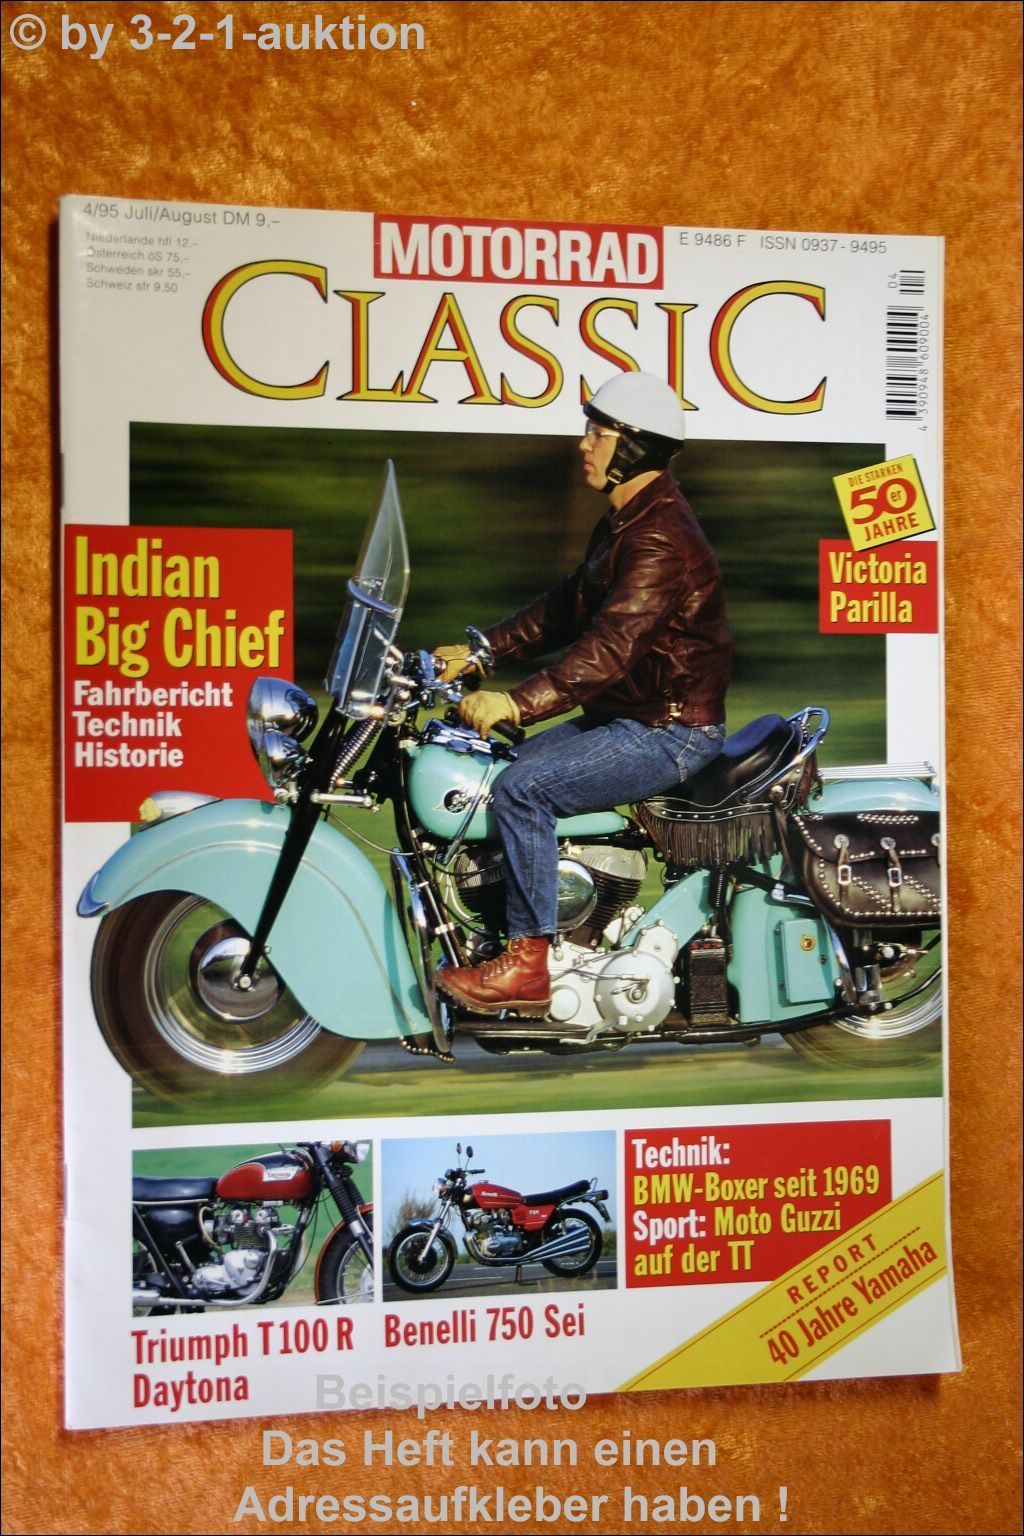 Motorrad Classic 4/95 Indian Big Chief Triumph Daytona